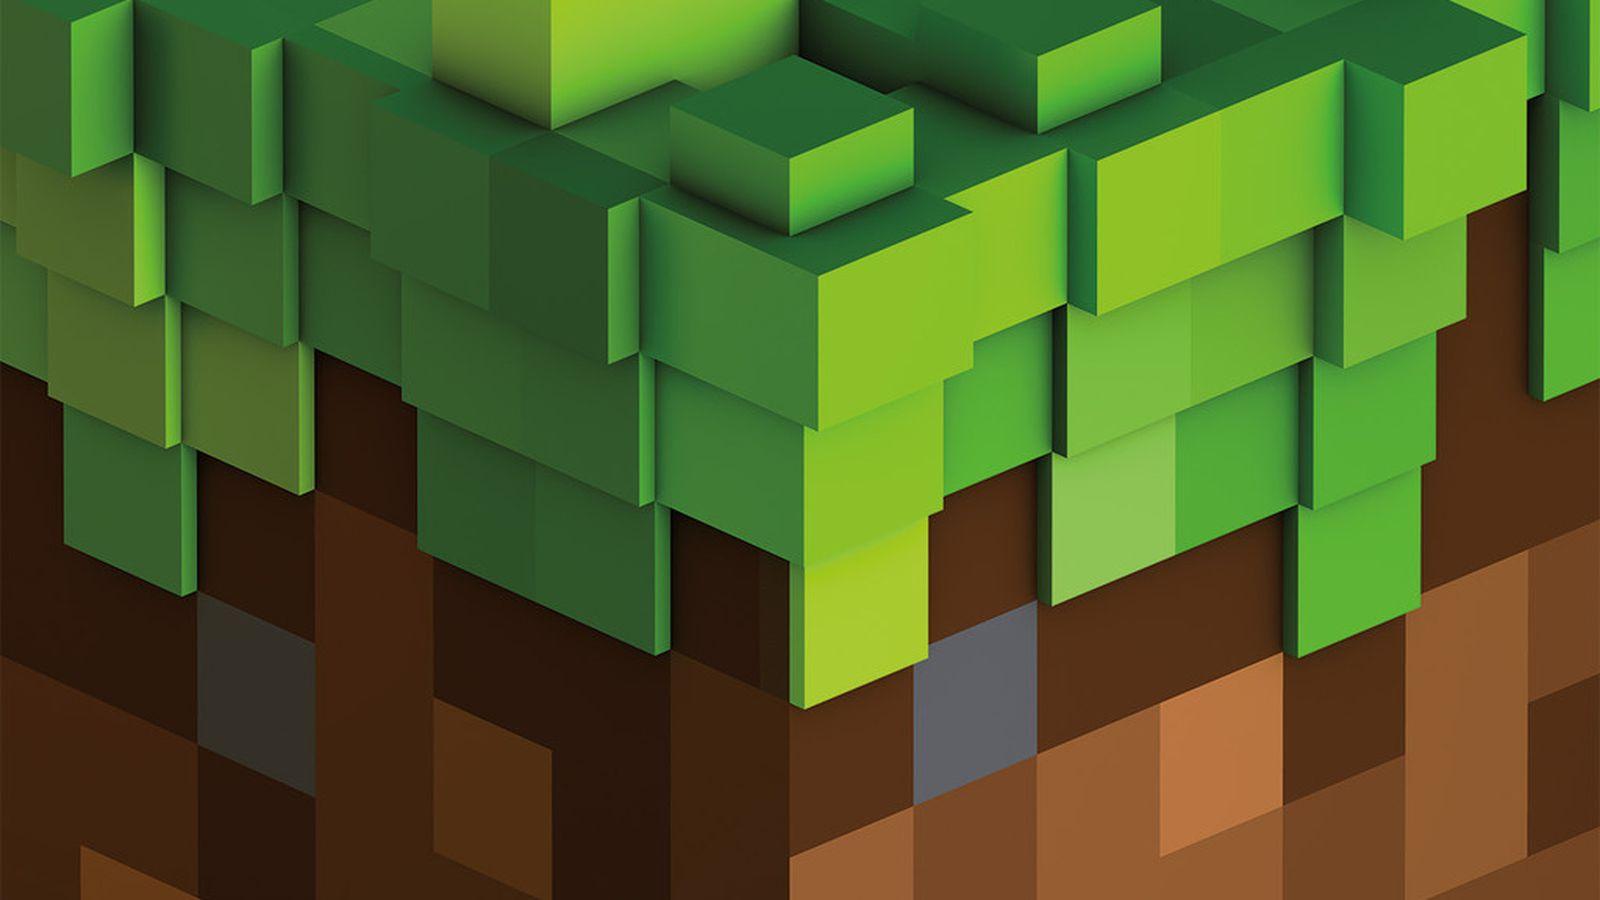 Get one of 1,000 special edition vinyl Minecraft albums